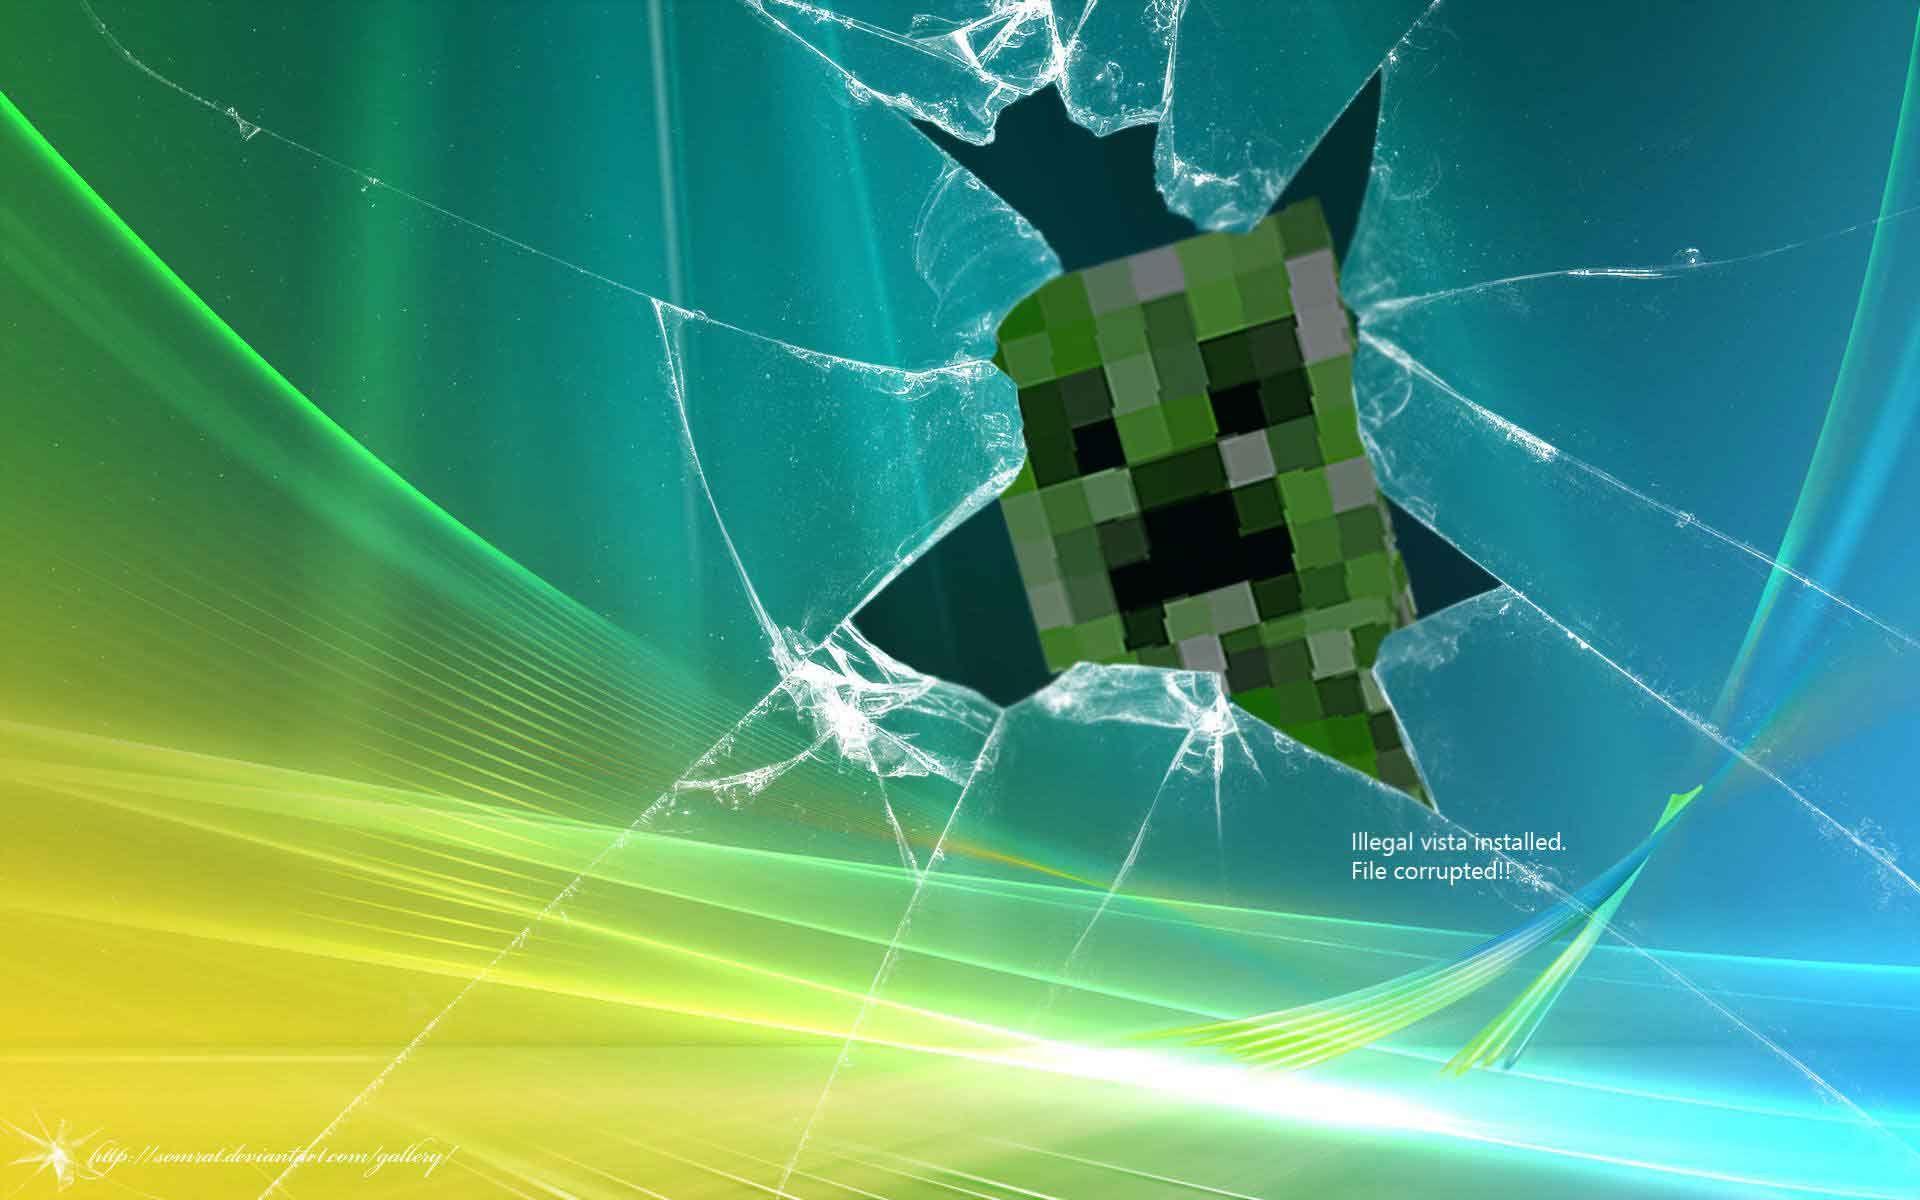 Images Of Minecraft Creepers Google Search Broken Screen Wallpaper Computer Screen Wallpaper Computer Wallpaper